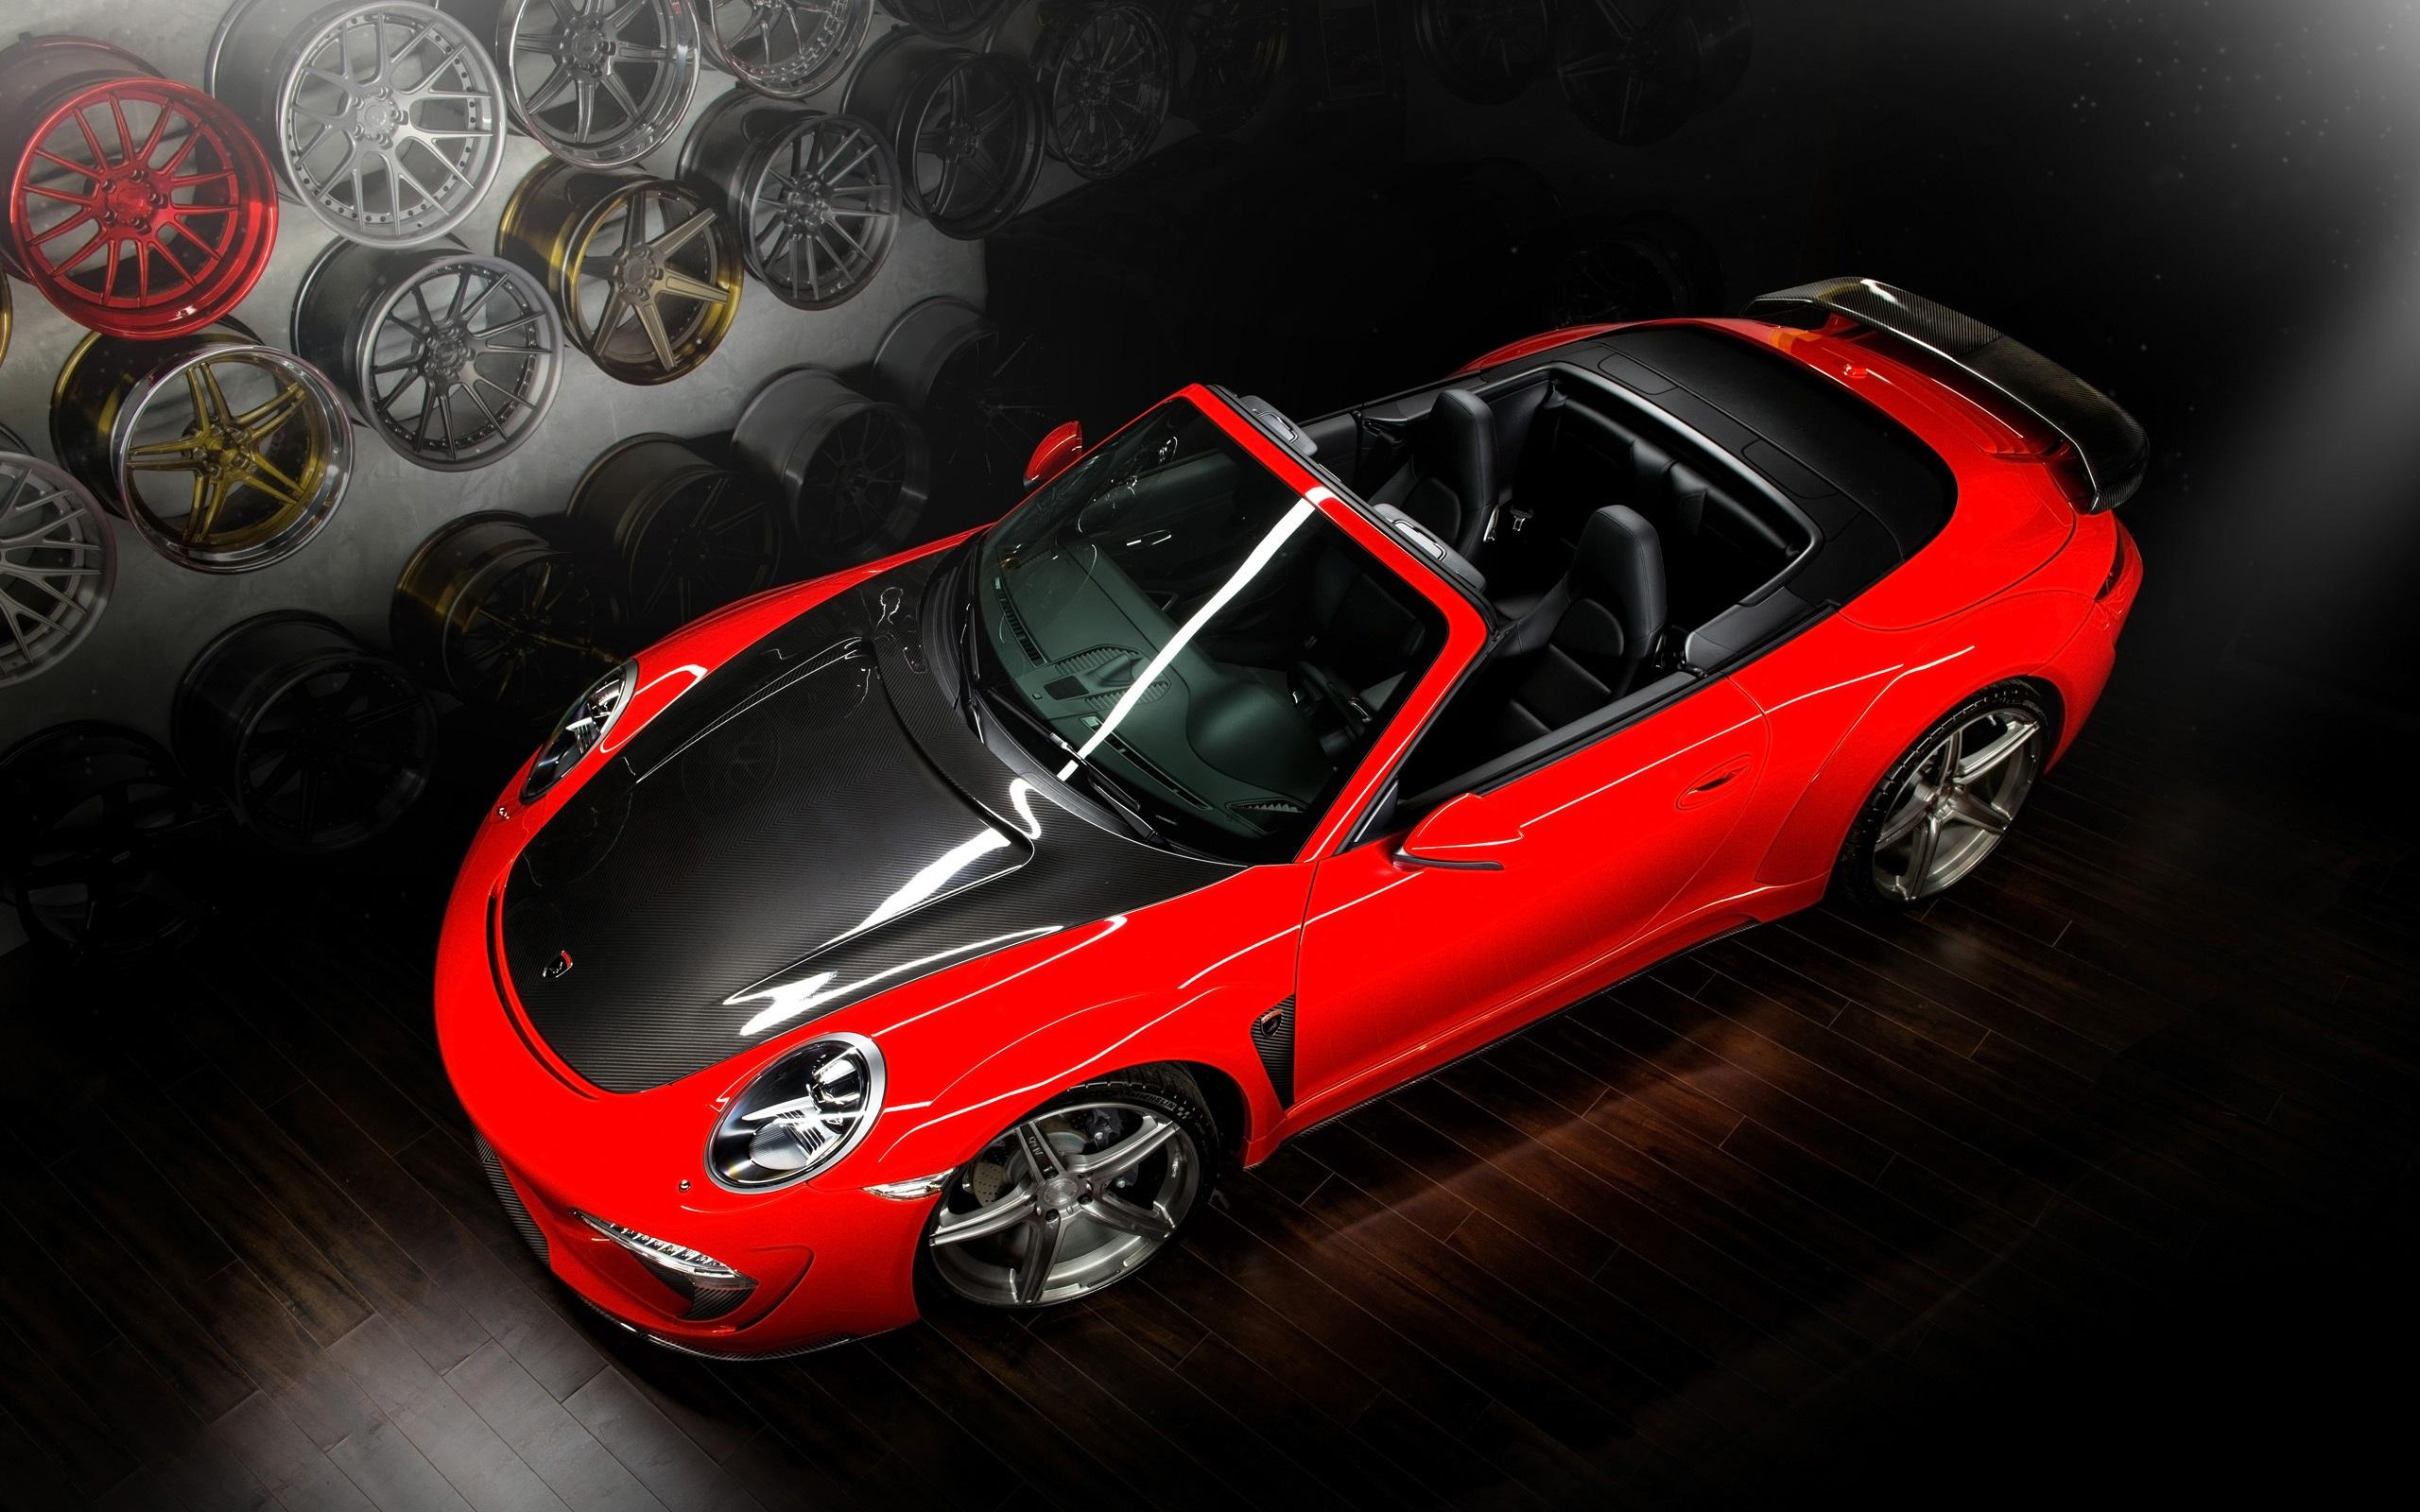 Fondos De Pantalla Porsche 991 Carrera Cabriolet Stinger